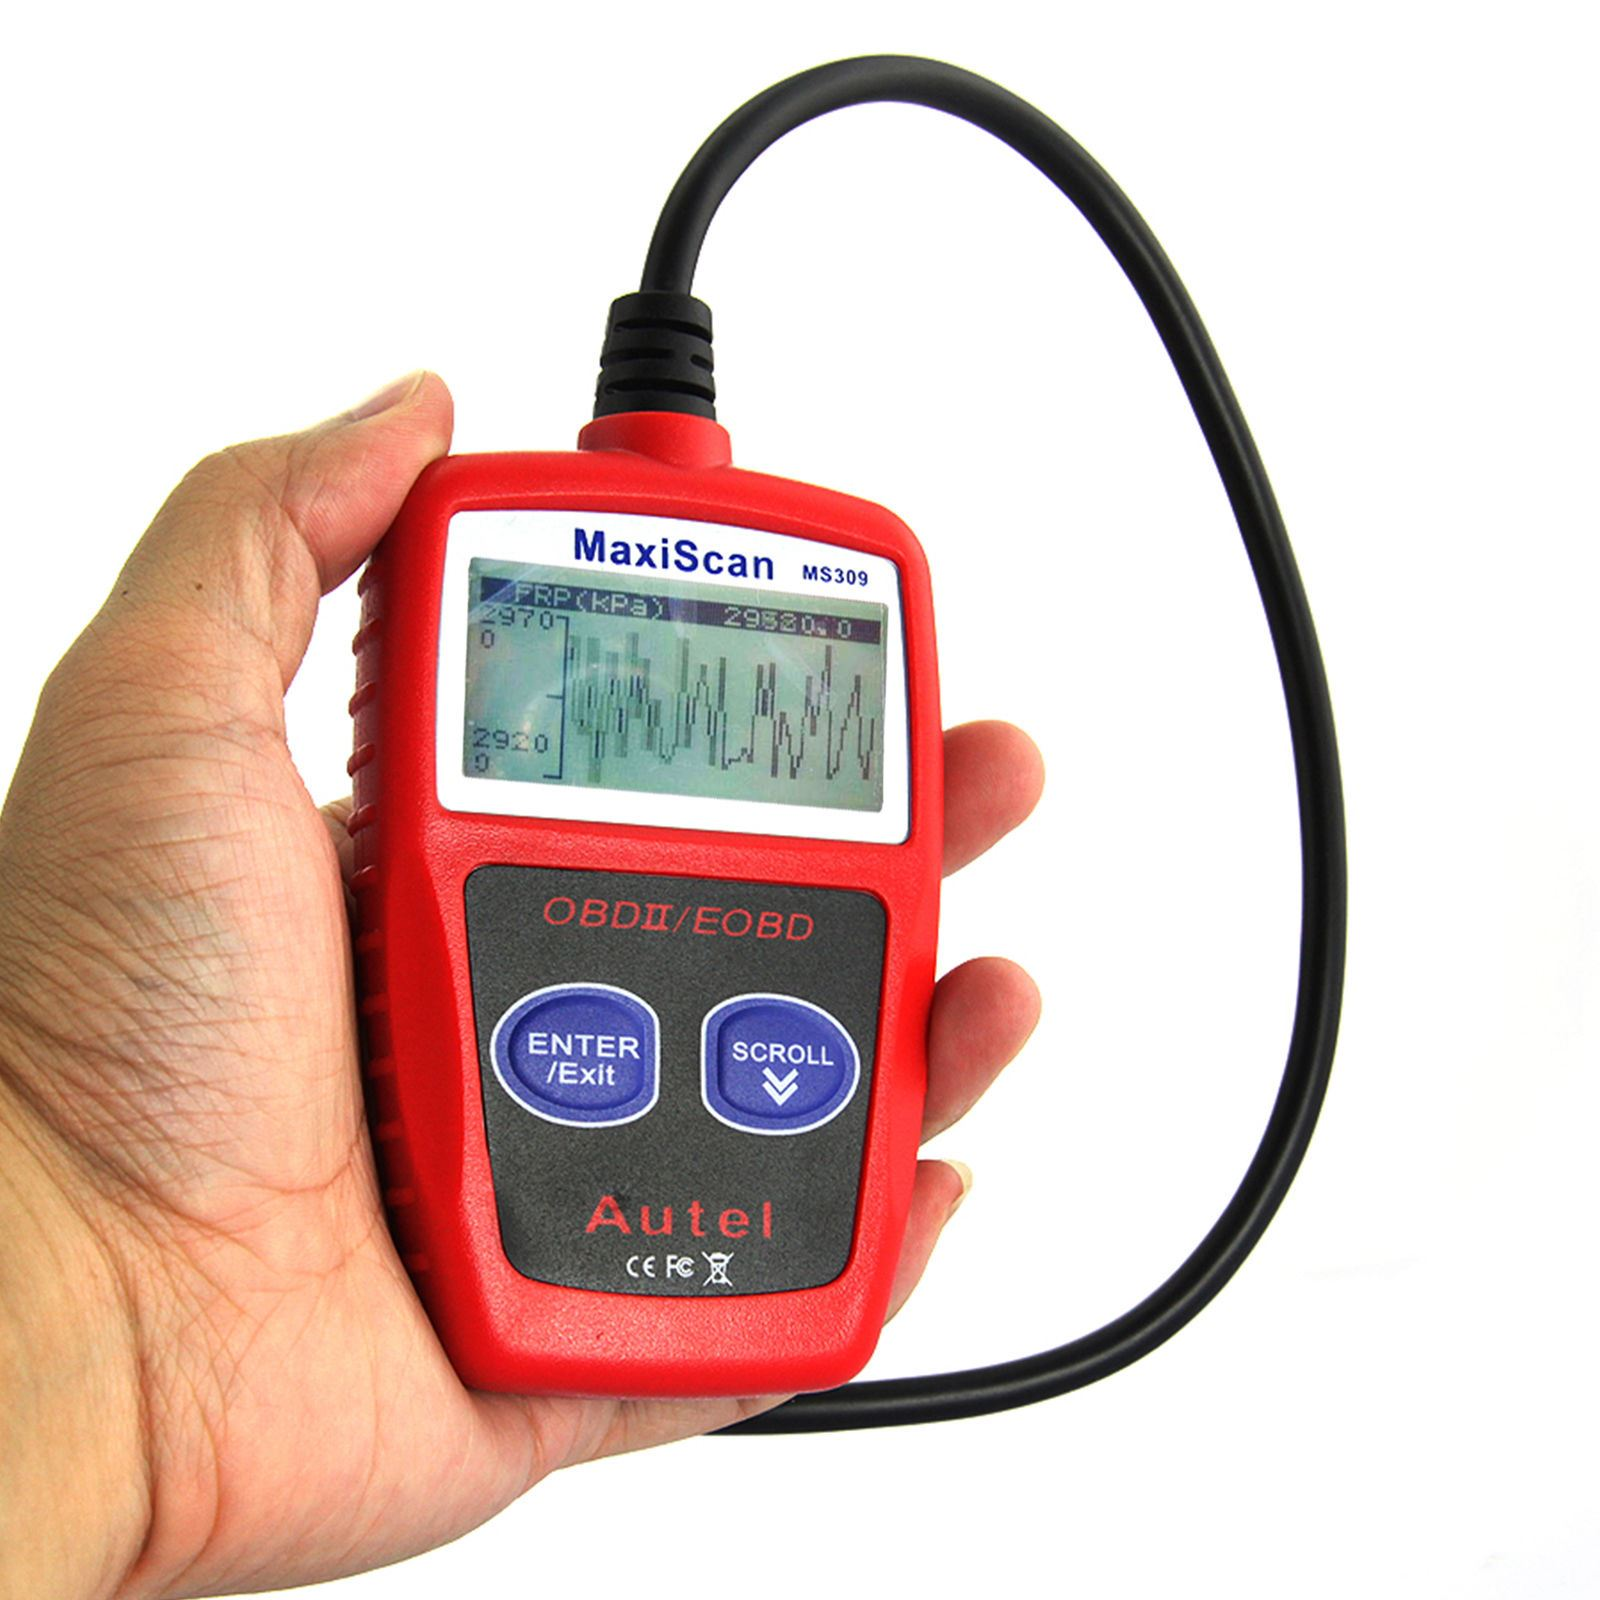 B2600i Retrieving Check Engine Light Cel Codes: CAR Fault Code Reader Engine Diagnostic Scanner Reset Tool